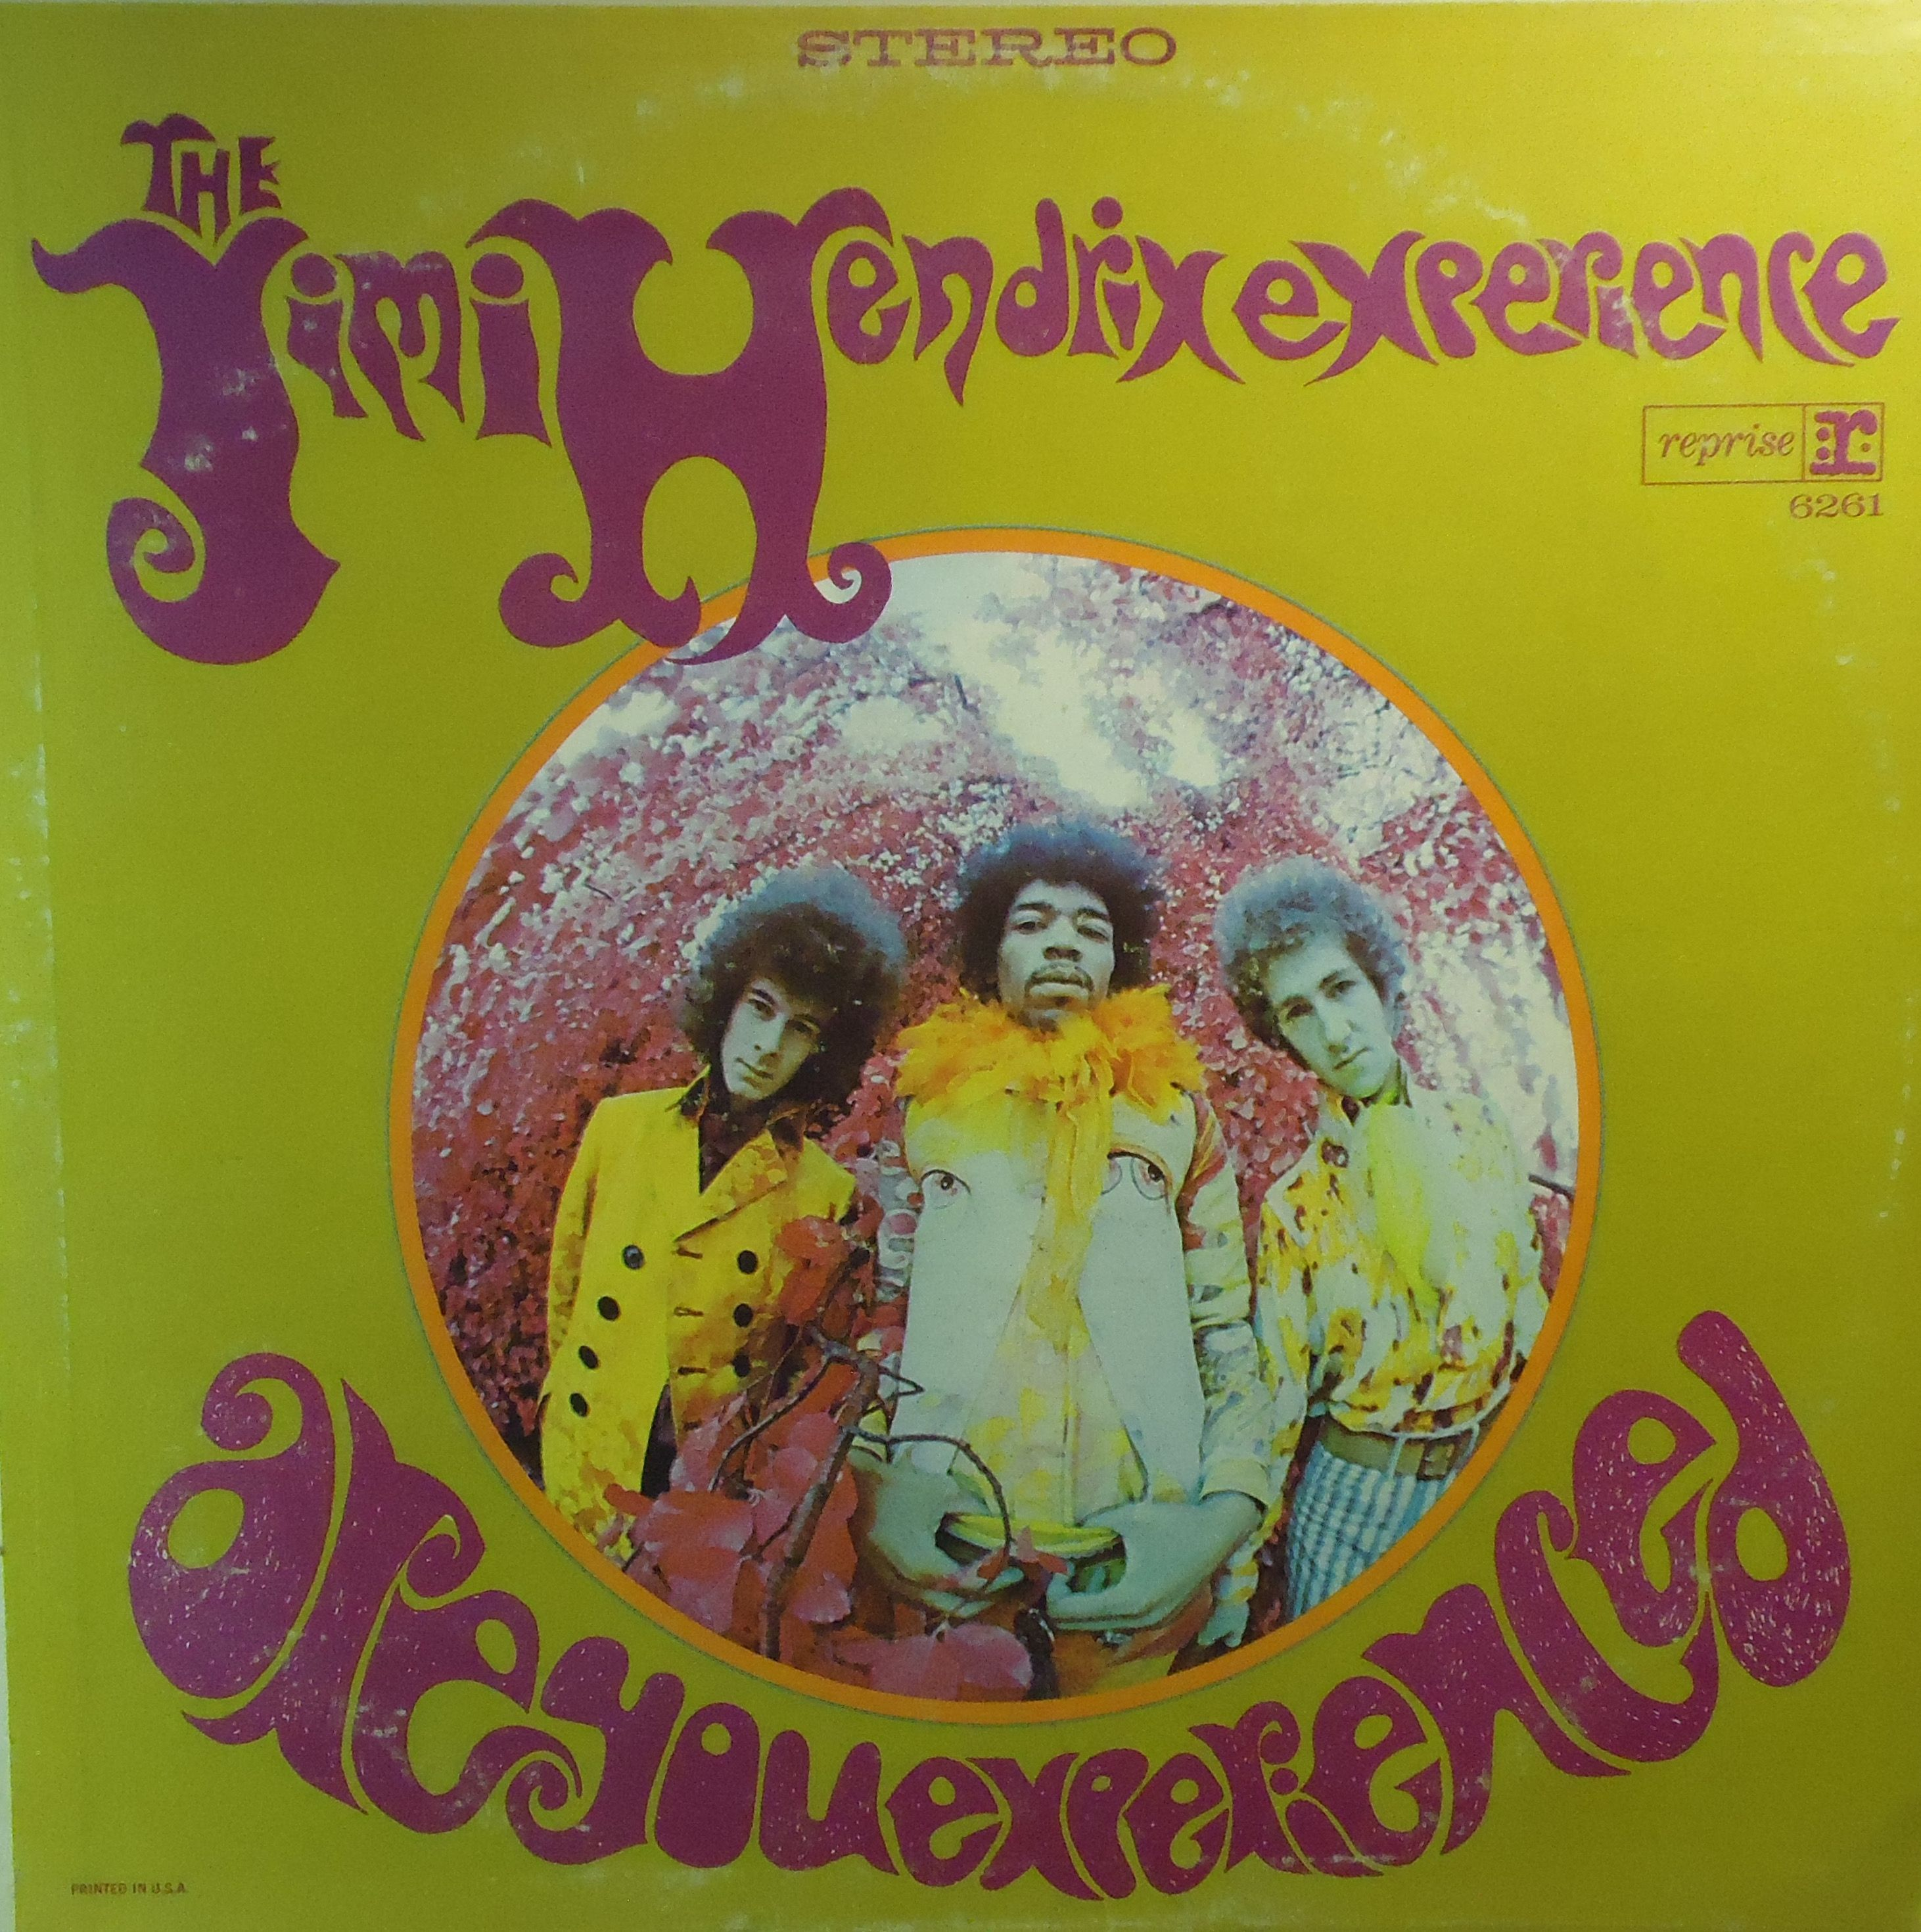 Pin By Spinning Turning Grooving On Vinyl Records Jimi Hendrix Experience Jimi Hendrix Vinyl Jimi Hendrix